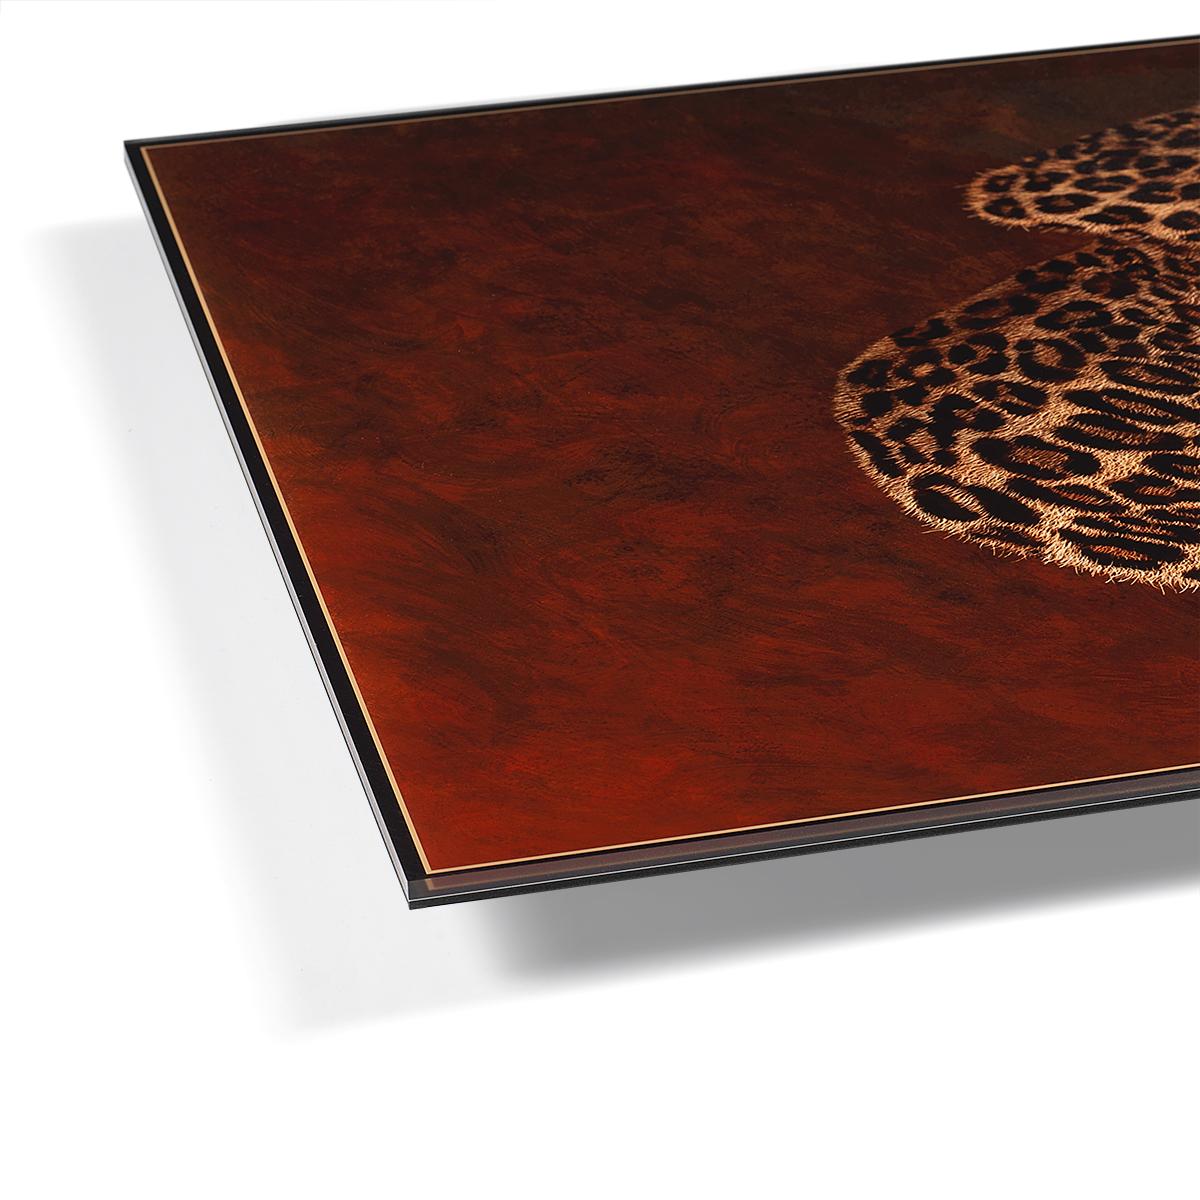 Encapsulated Print Edge of Acrylic Print Encapsulation